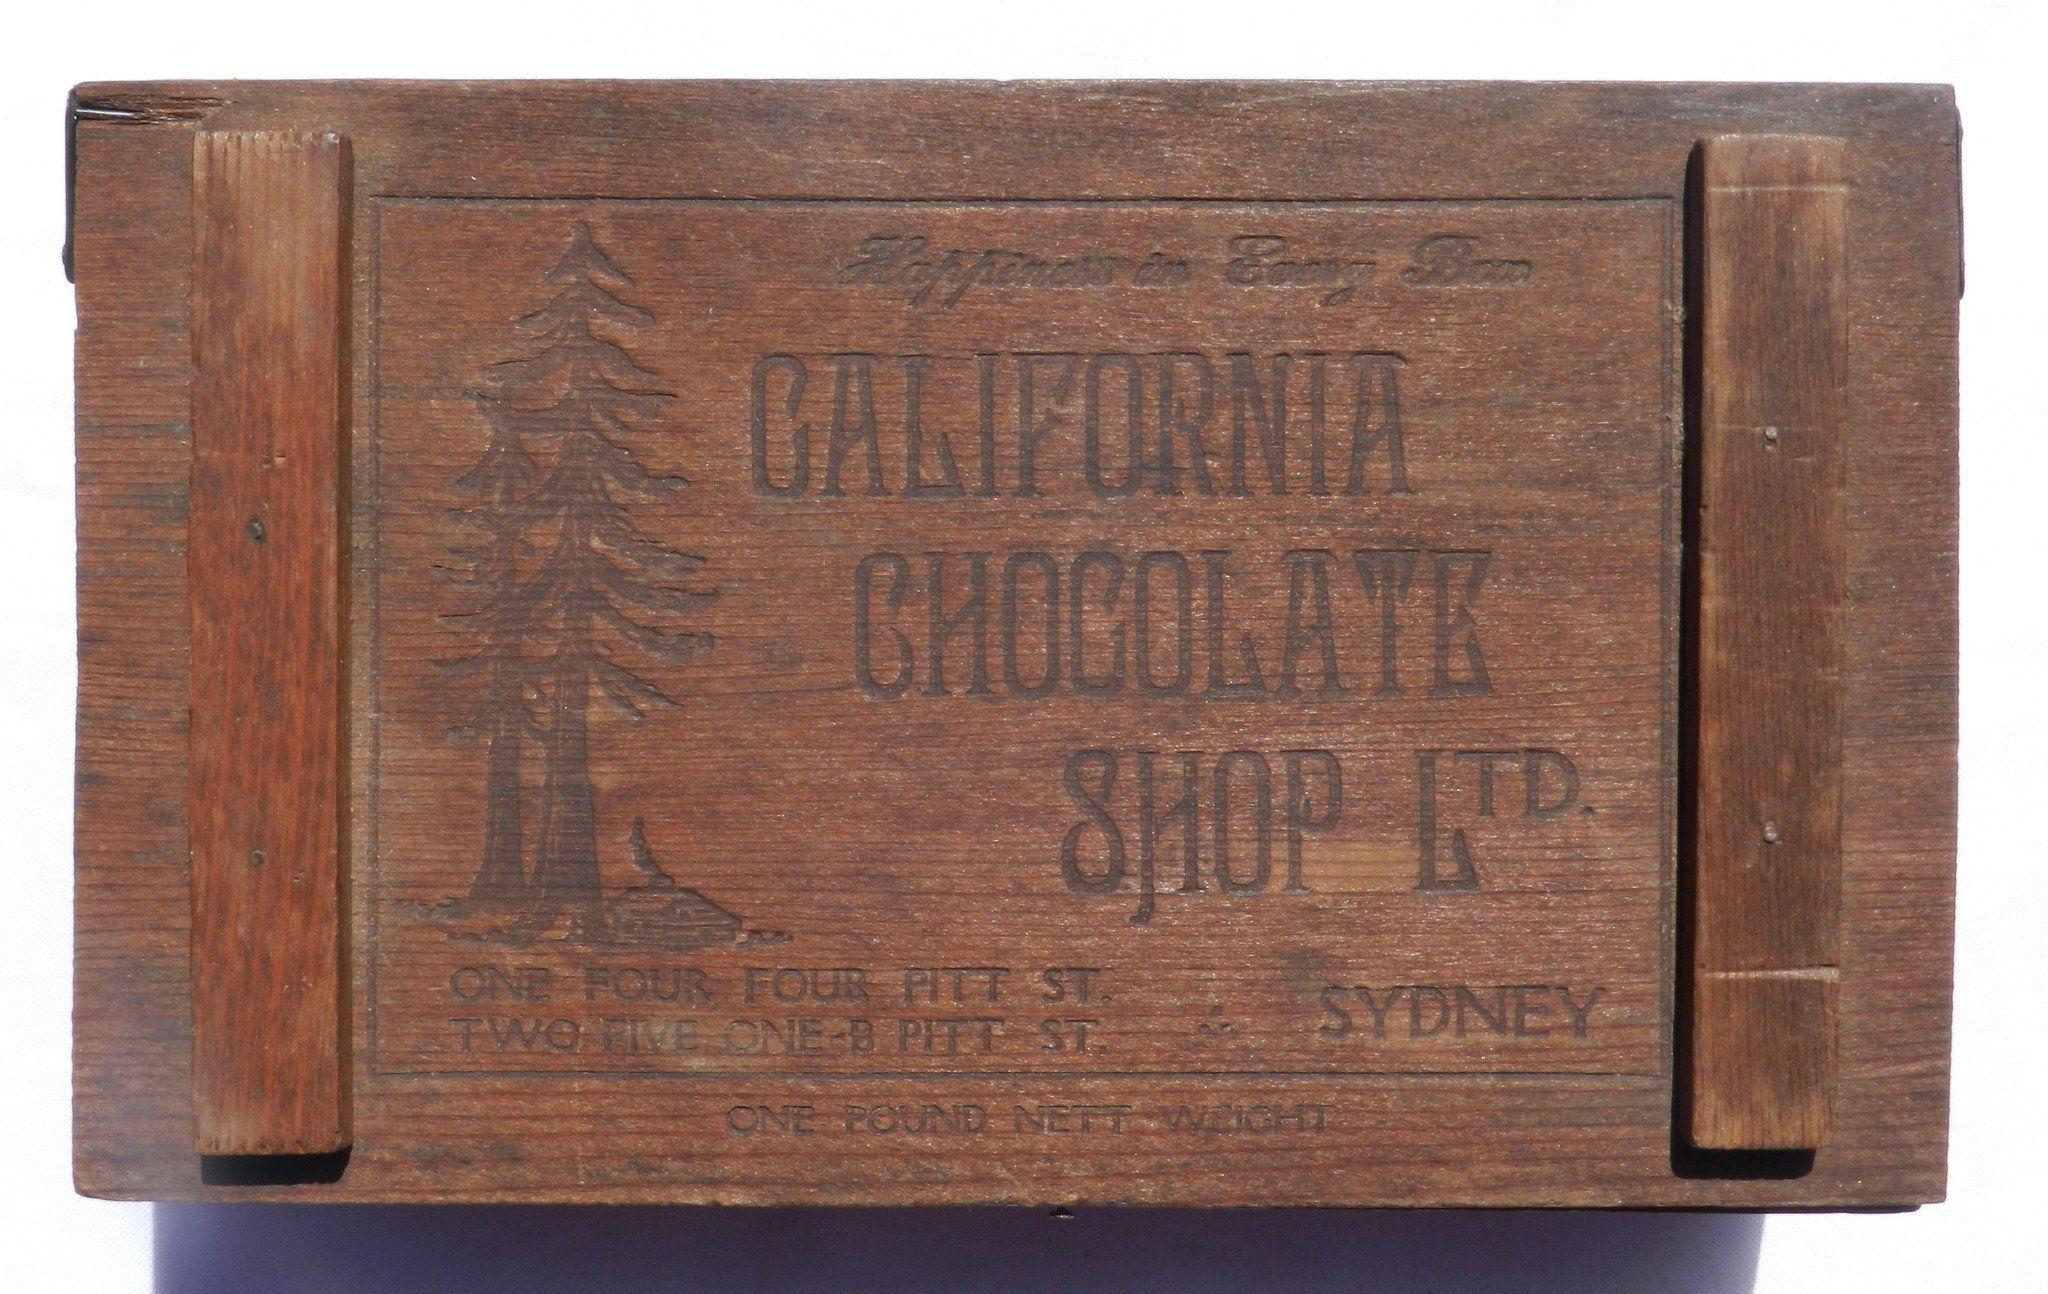 California Chocolate Wooden Box 1940s Antiquities Wooden